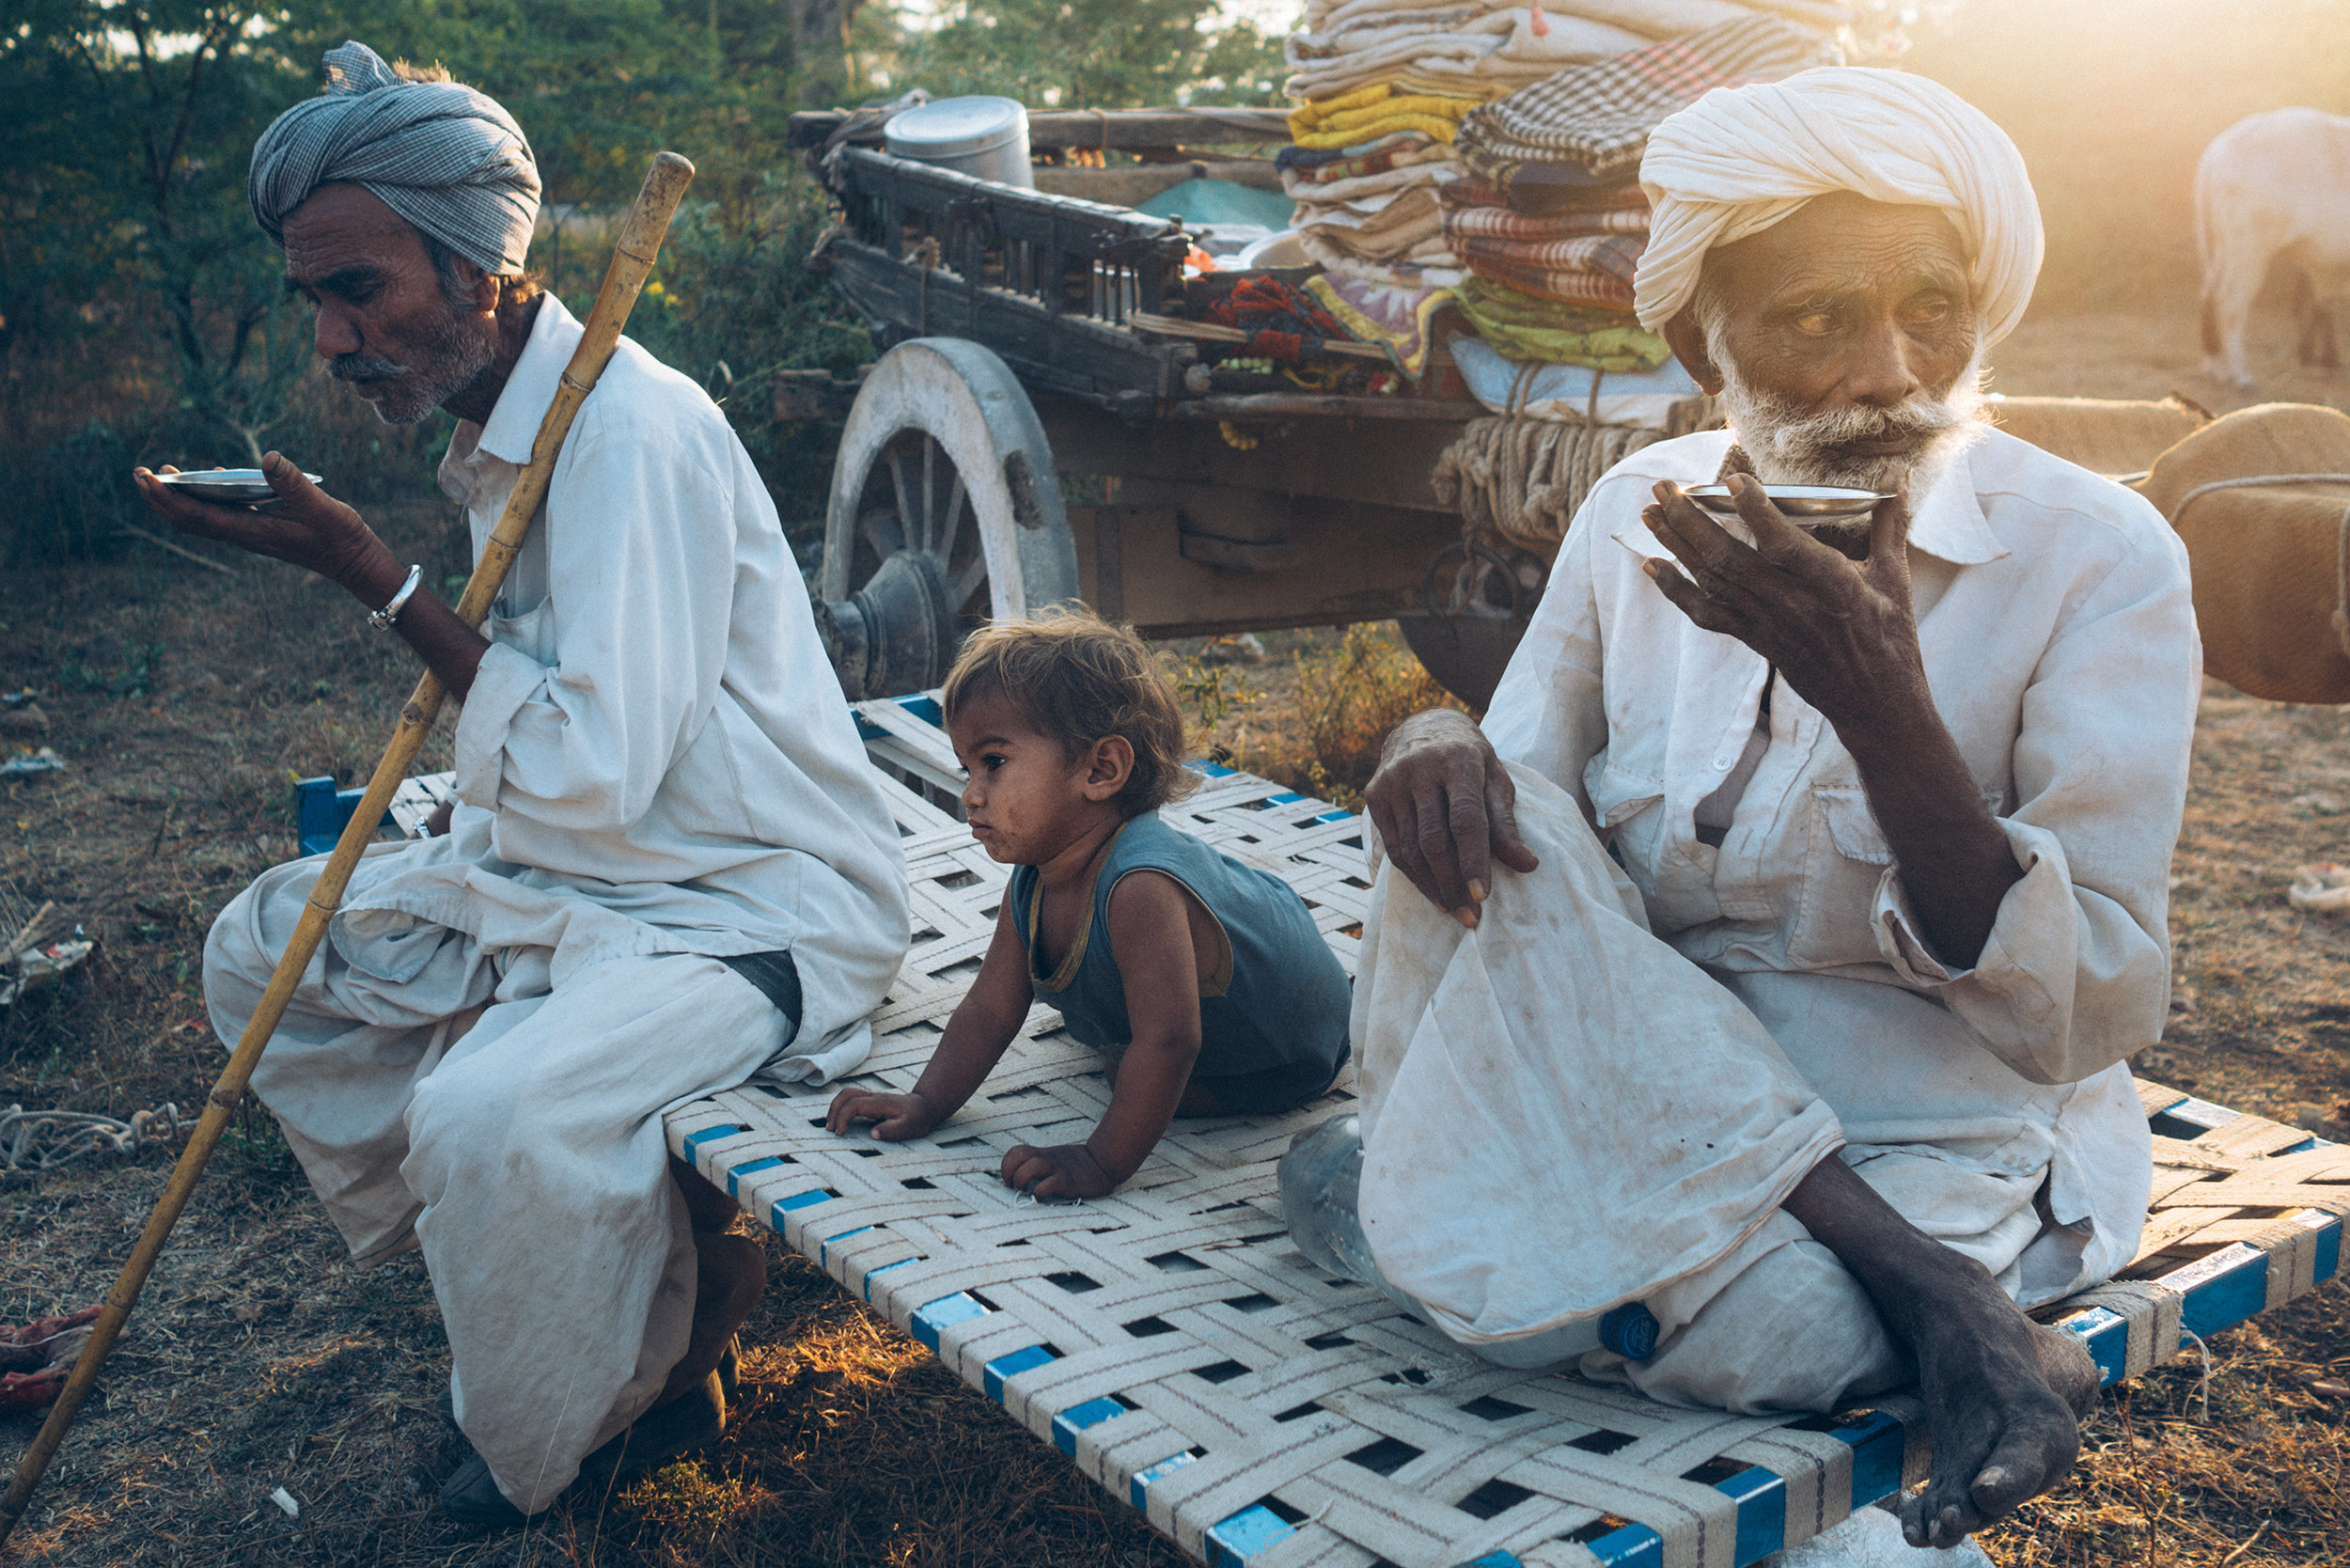 Nomads having tea